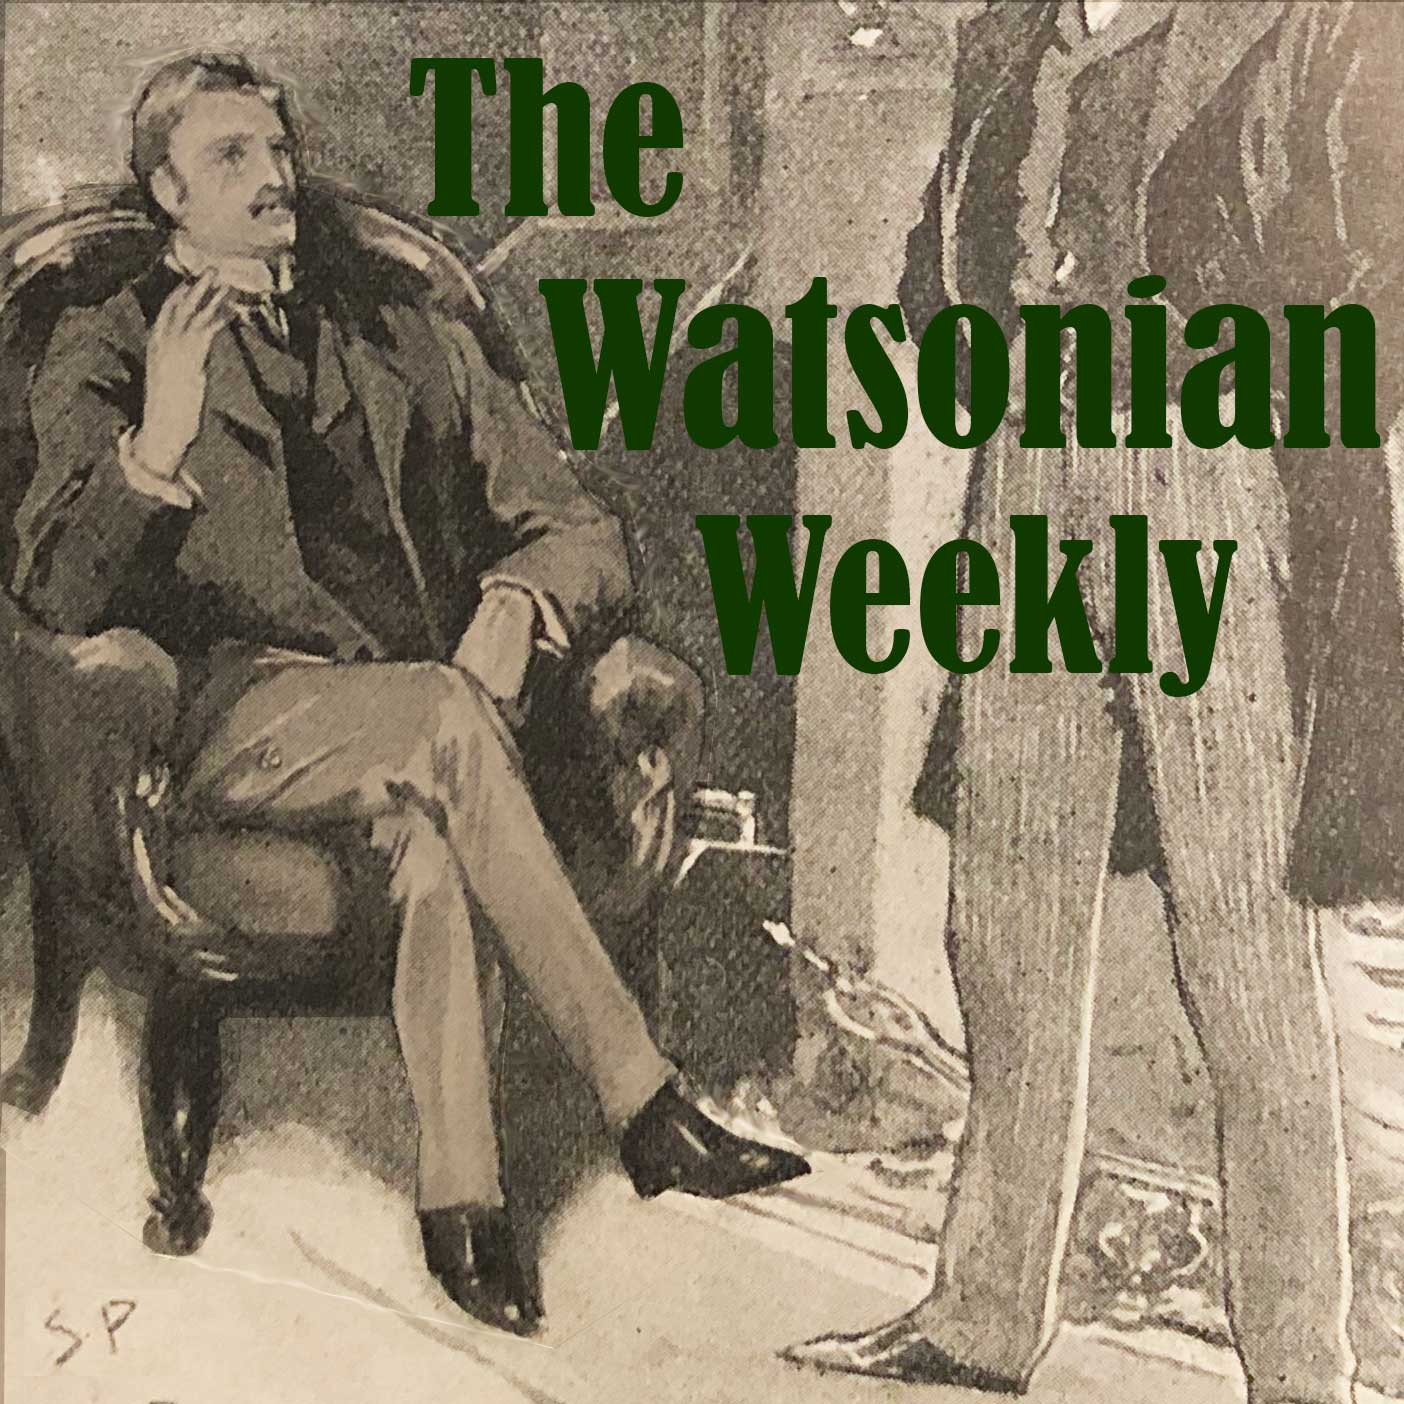 The Watsonian Weekly show image